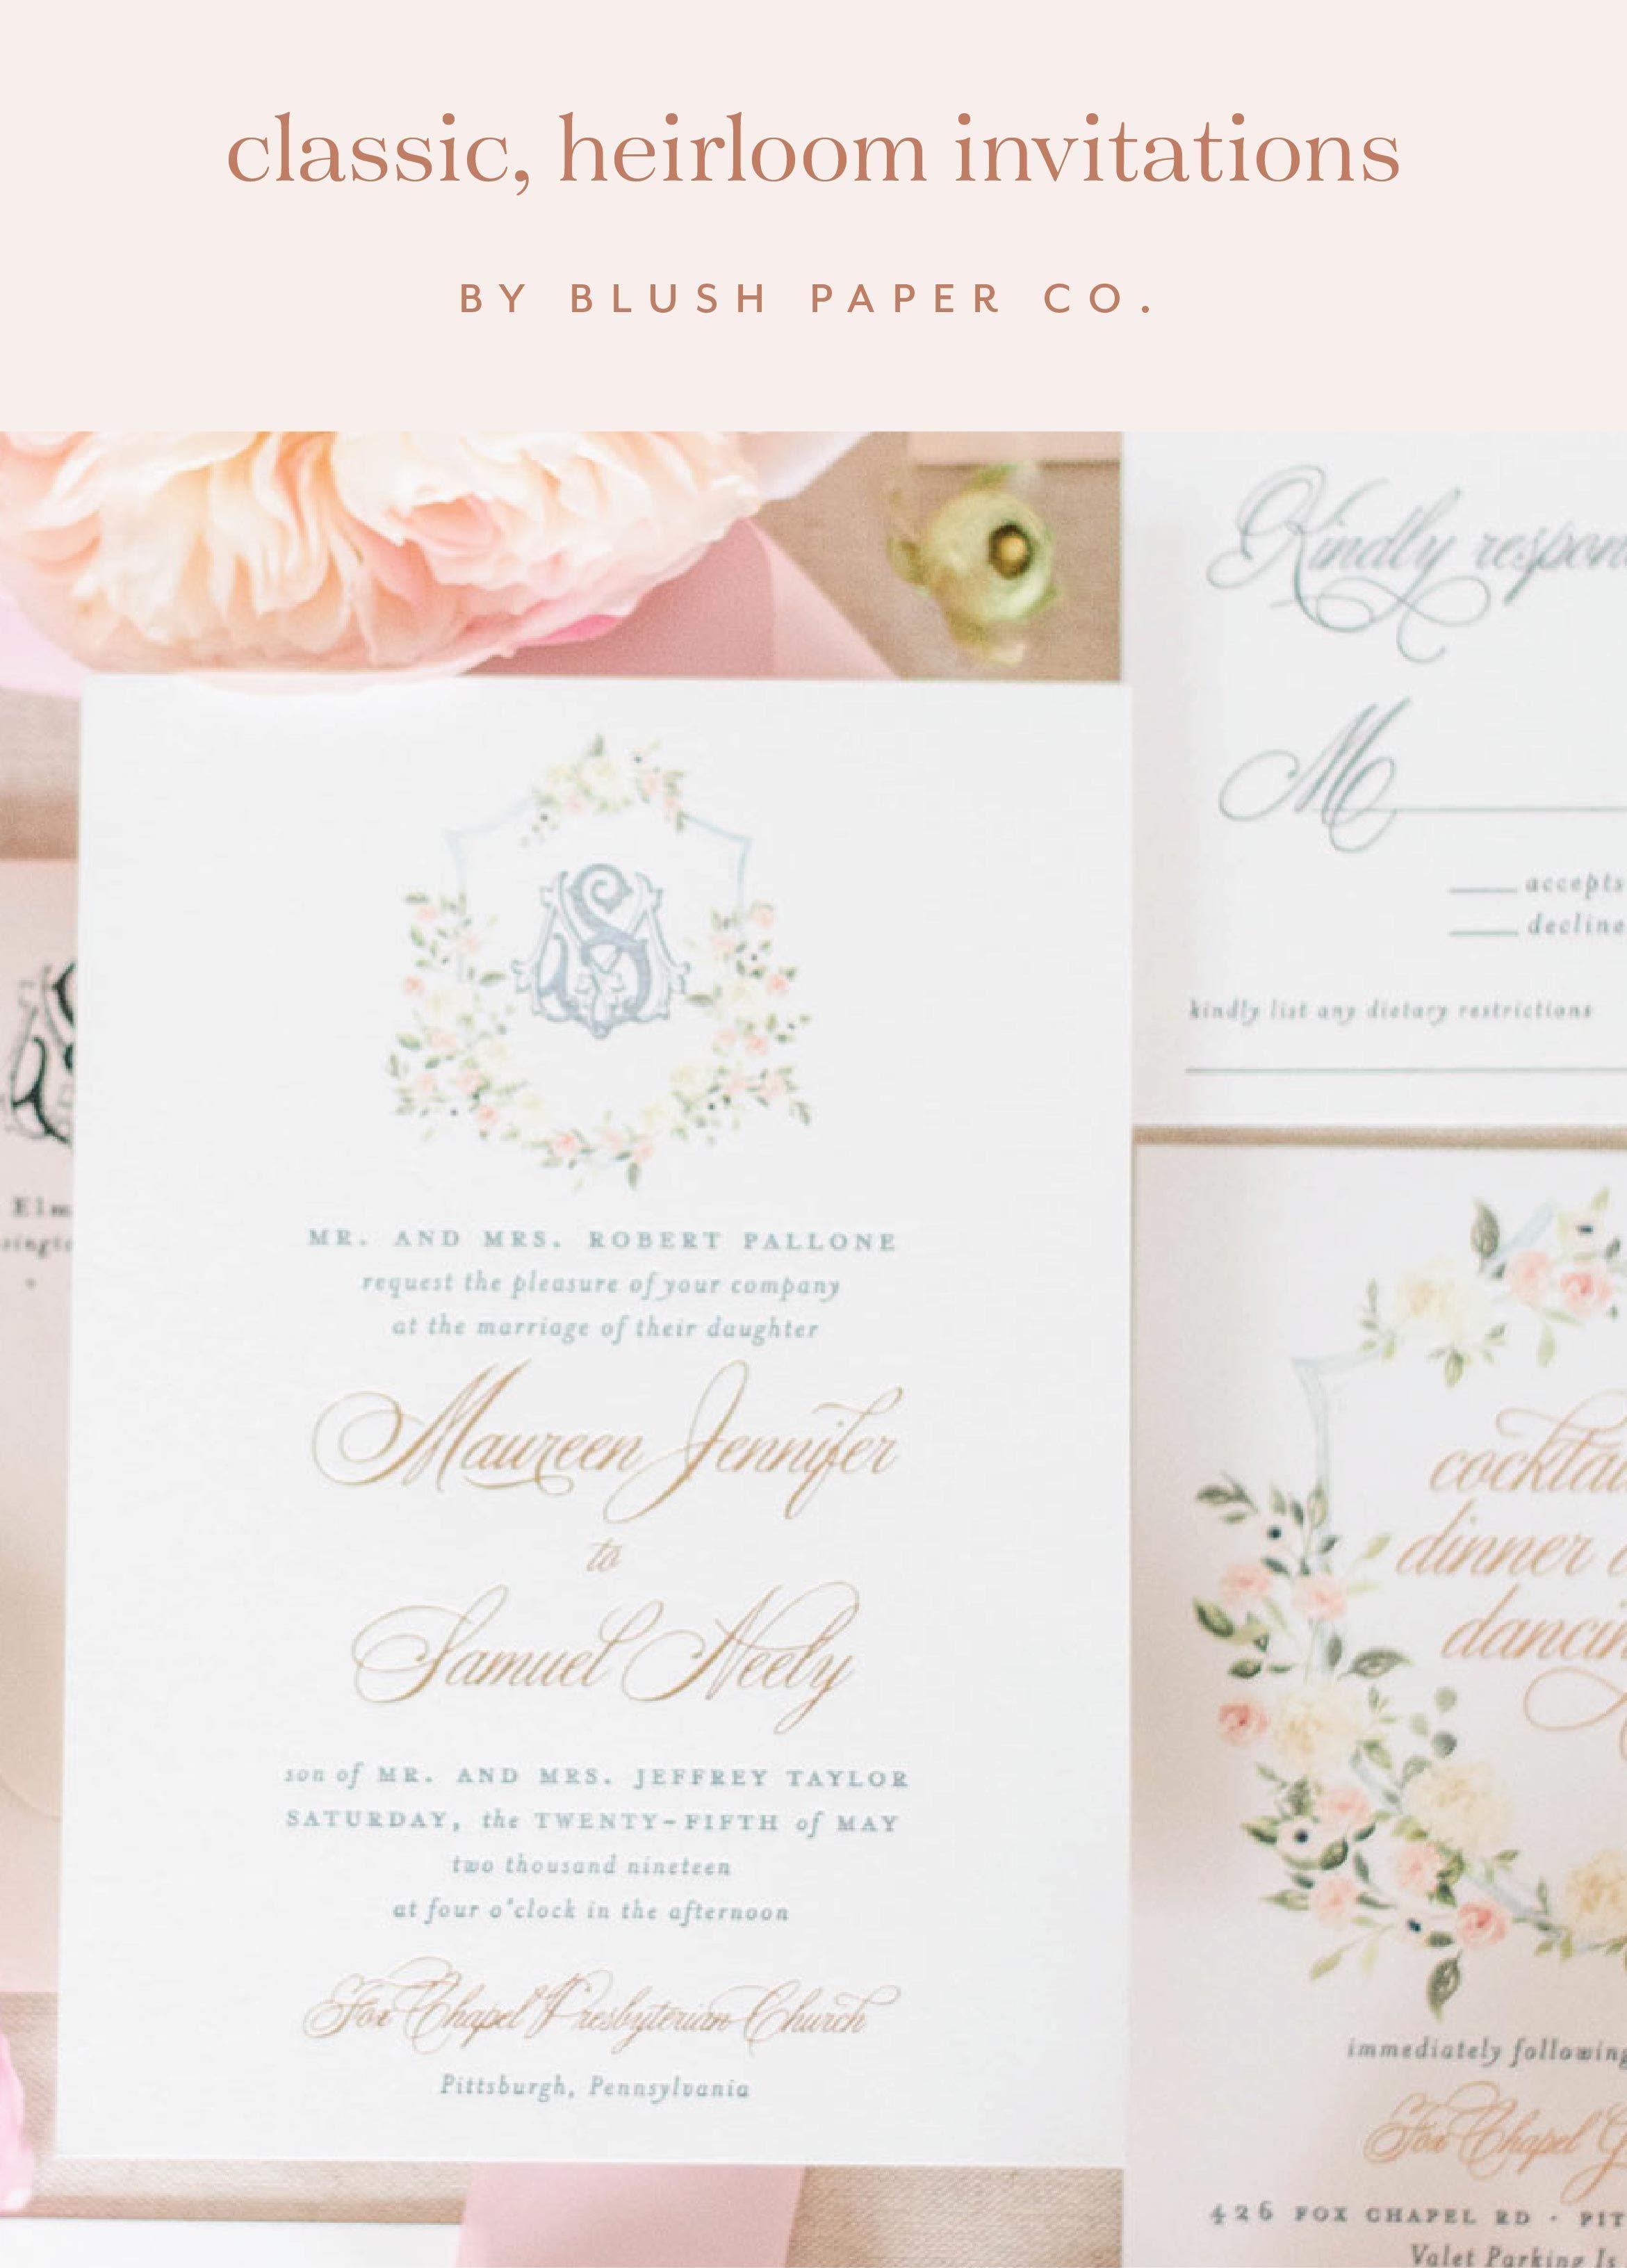 Classic Heirloom Wedding Invitations Spring Wedding Invitations Blush Wedding Invitations Printing Wedding Invitations